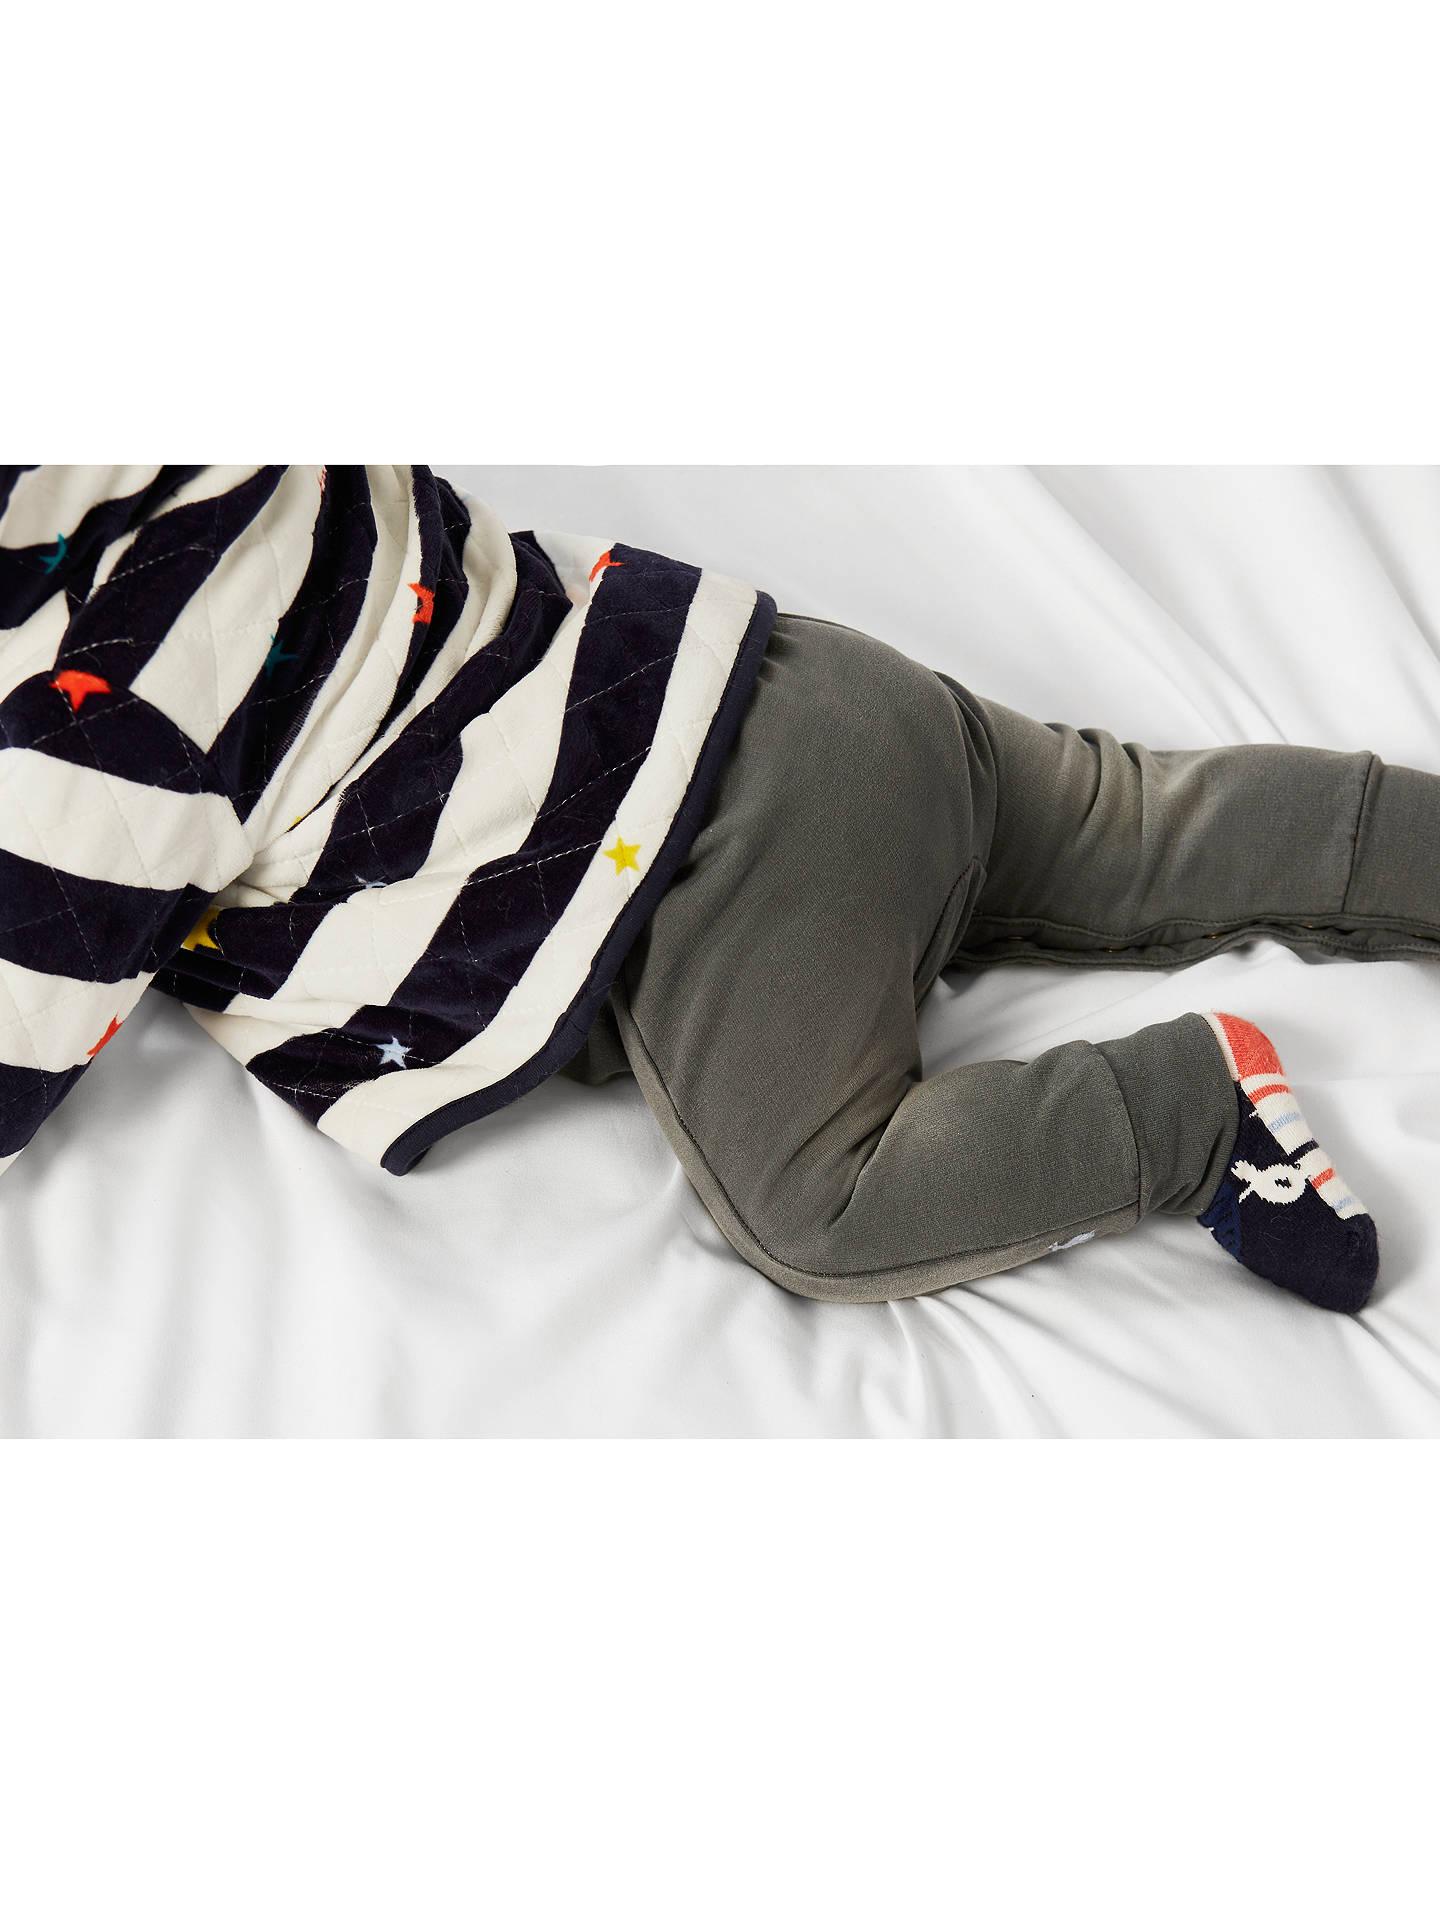 Joules Baby Alex Velour Quilted Hooded Jacket NEWBORN in  Size Newborn